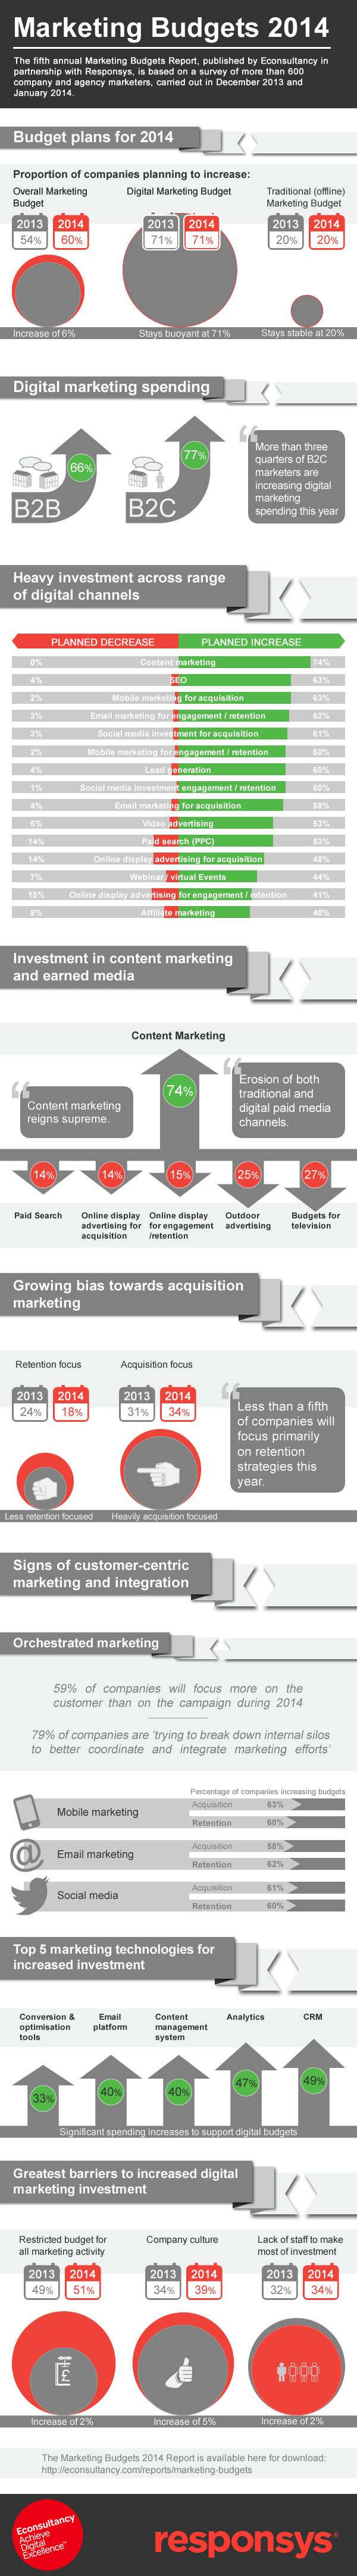 Marketing-Budgets-2014-Infographic-jpeg